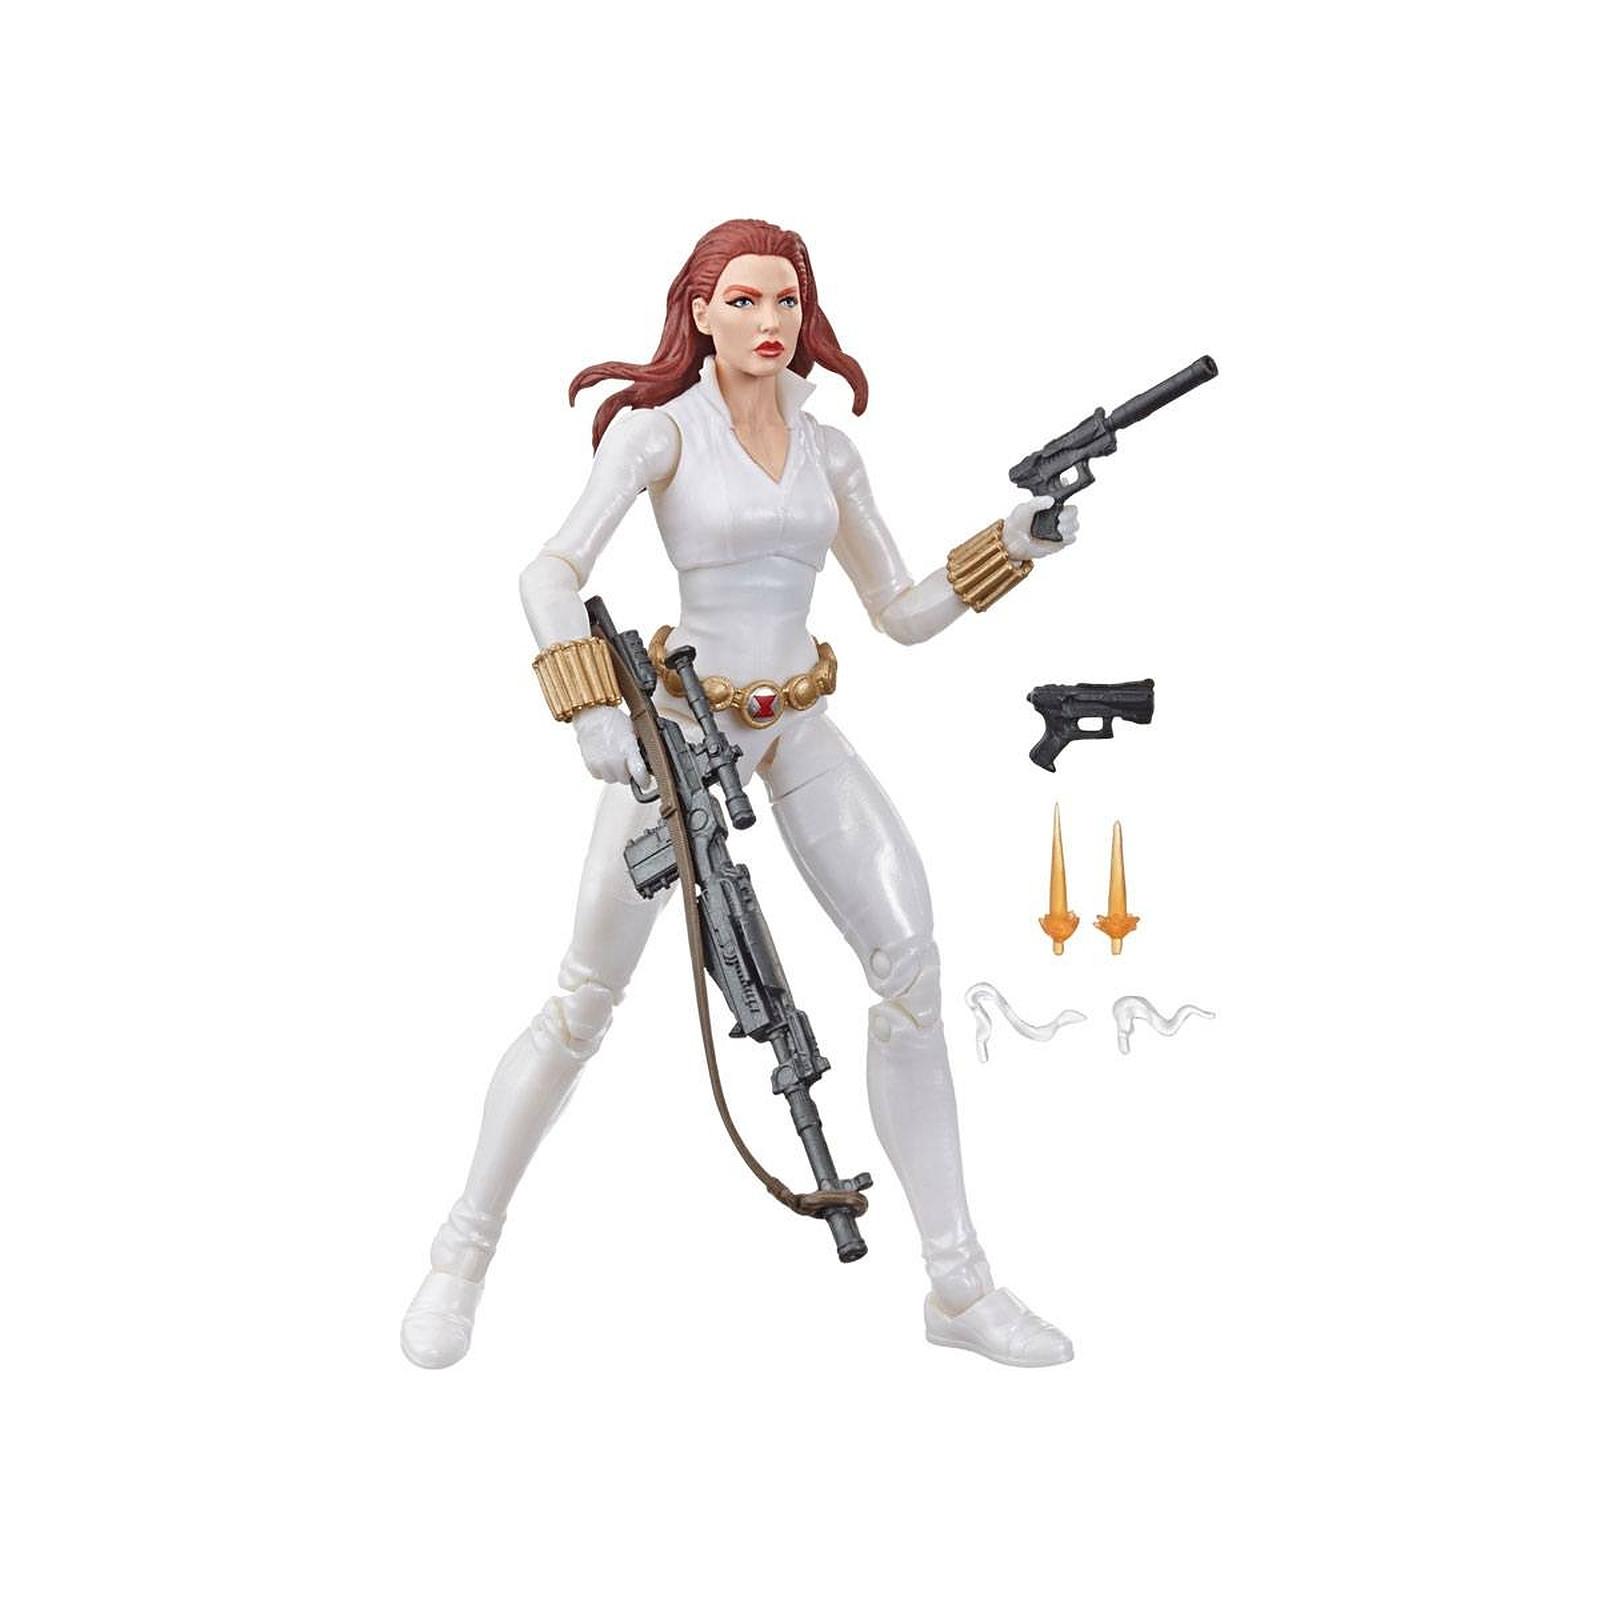 Marvel Legends Series - Figurine Black Widow White Suit Deadly Origin 15 cm